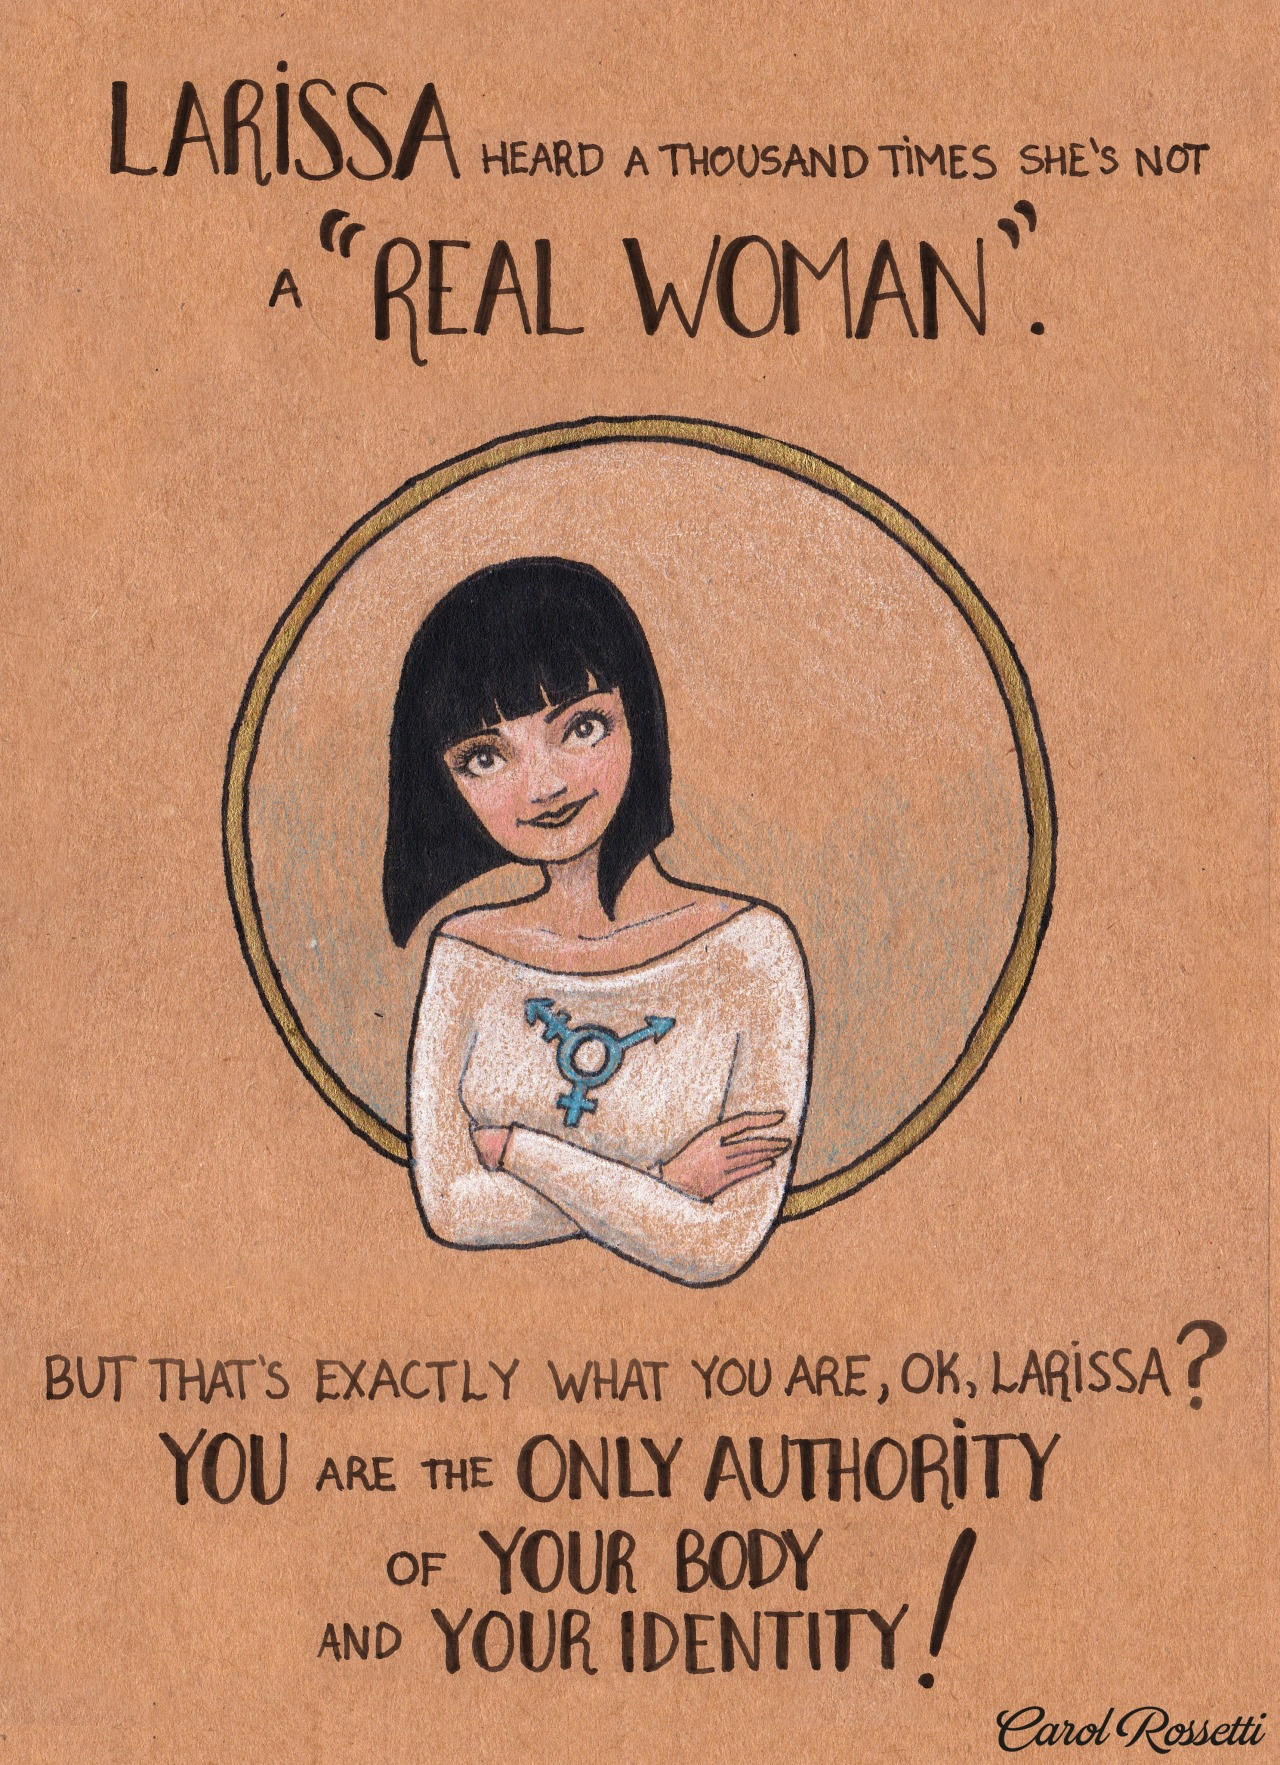 'Real Woman'